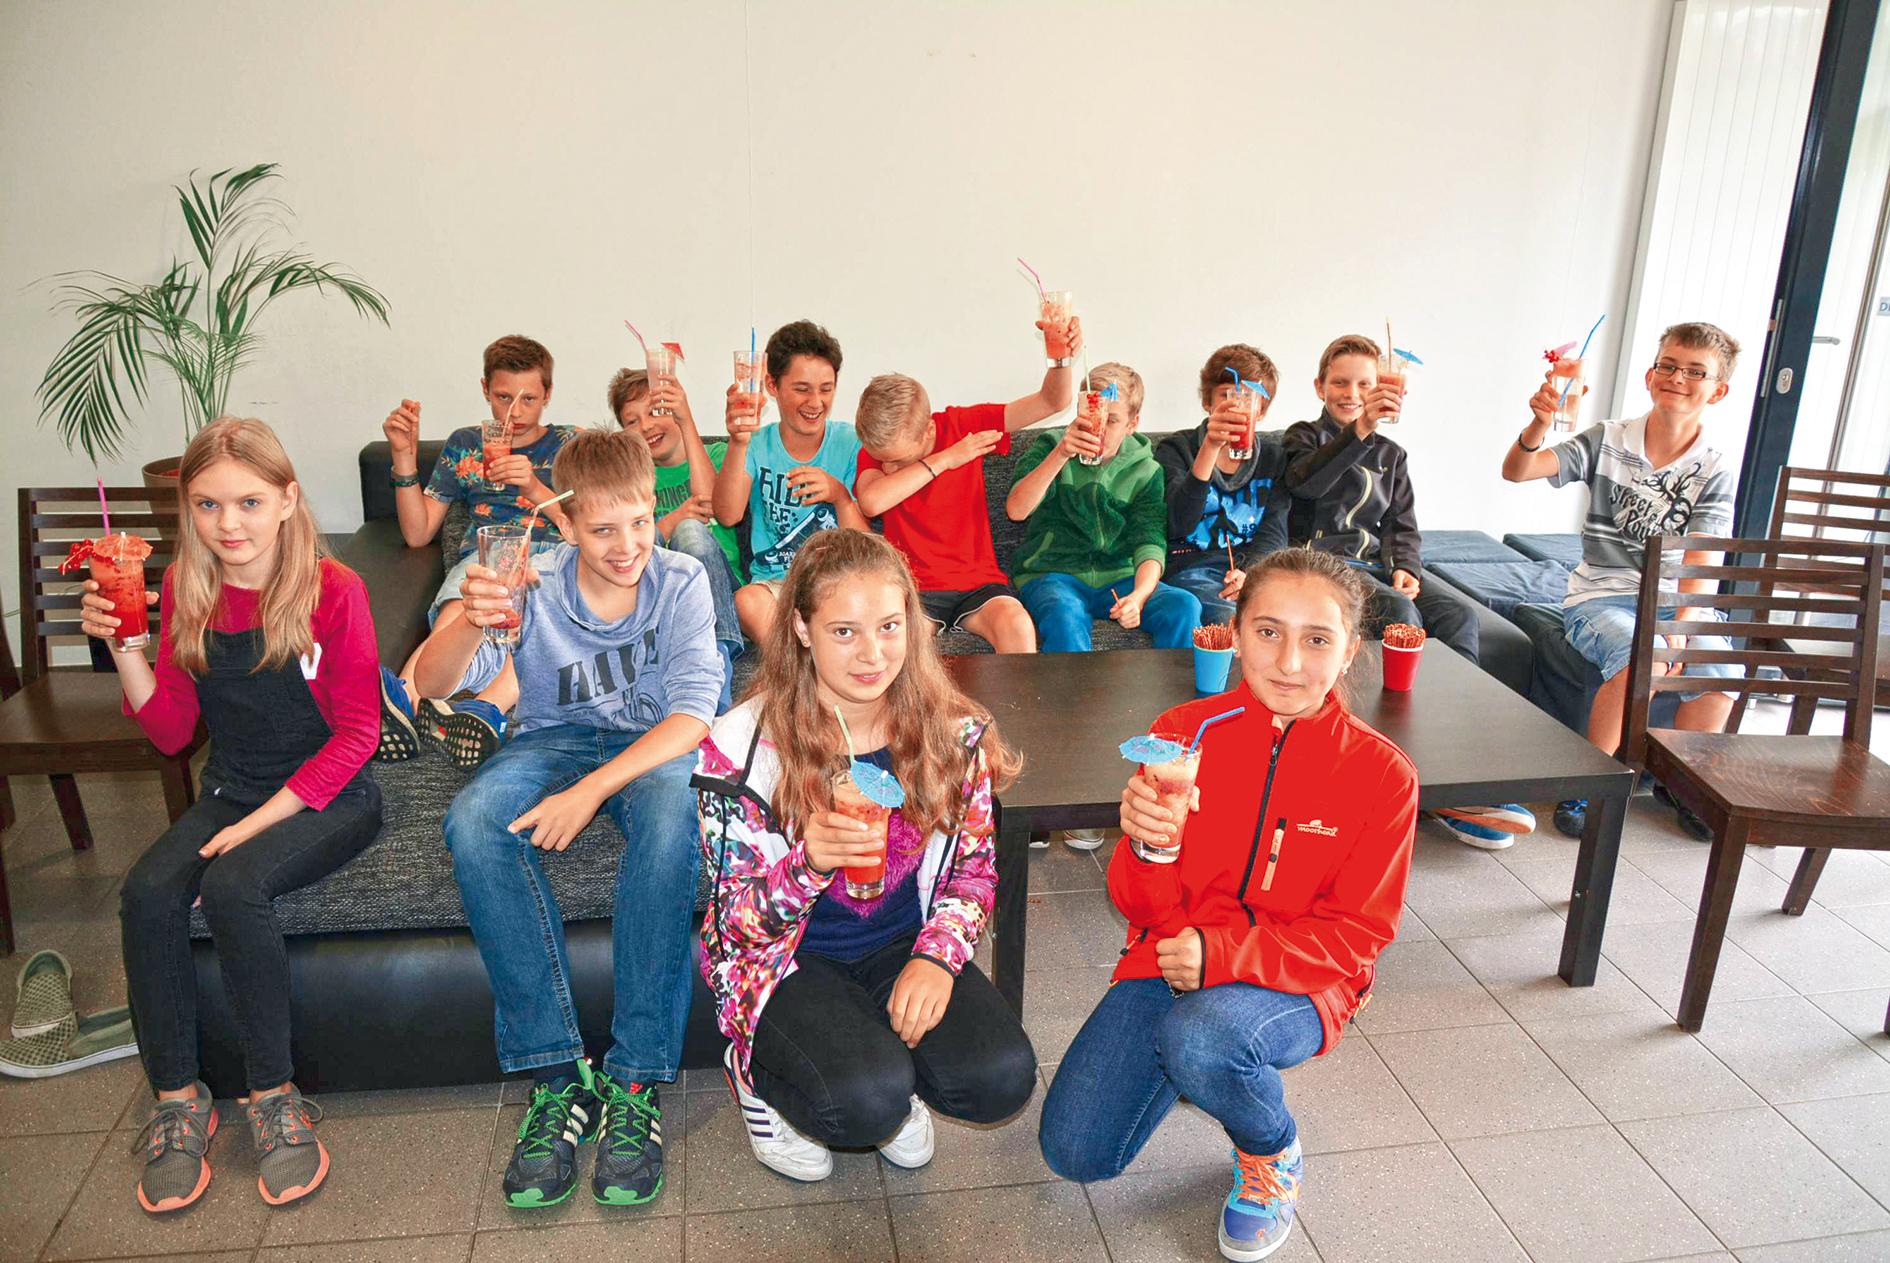 Partygetränke auch ohne Alkohol - meier-Magazin.de